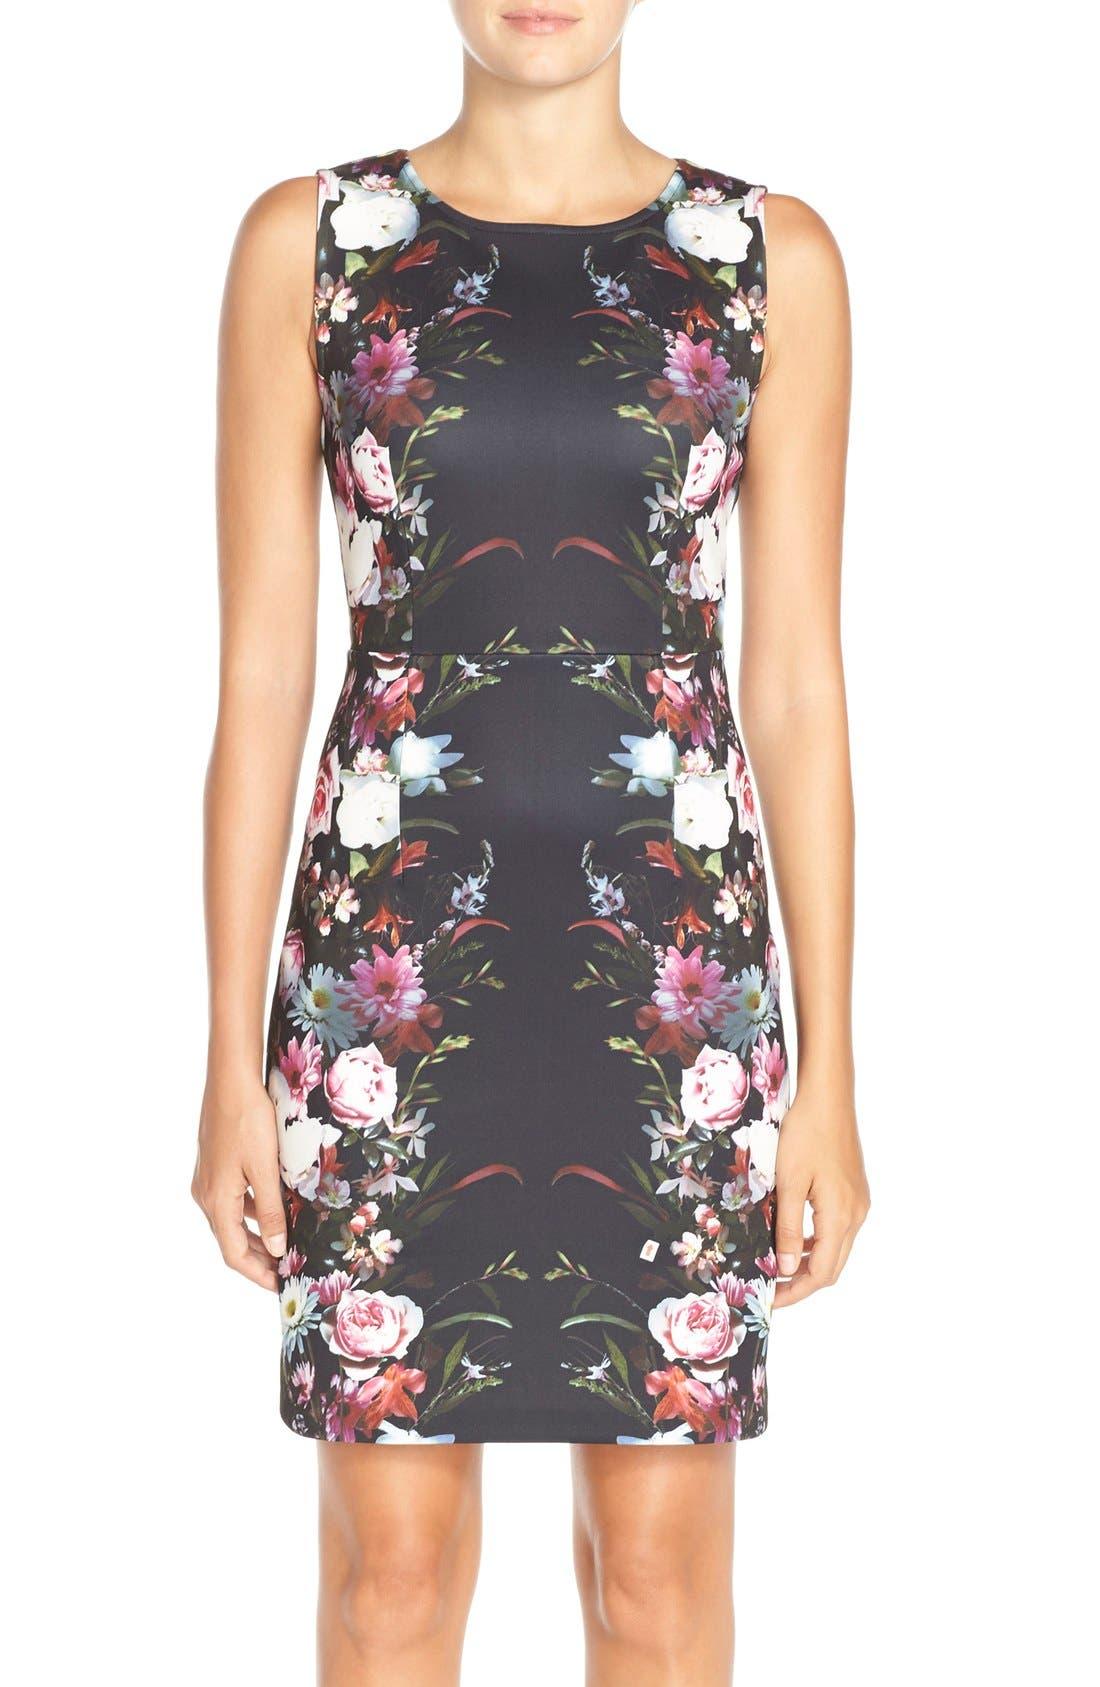 Main Image - Felicity & Coco Floral Print Scuba Sheath Dress (Regular & Petite) (Nordstrom Exclusive)